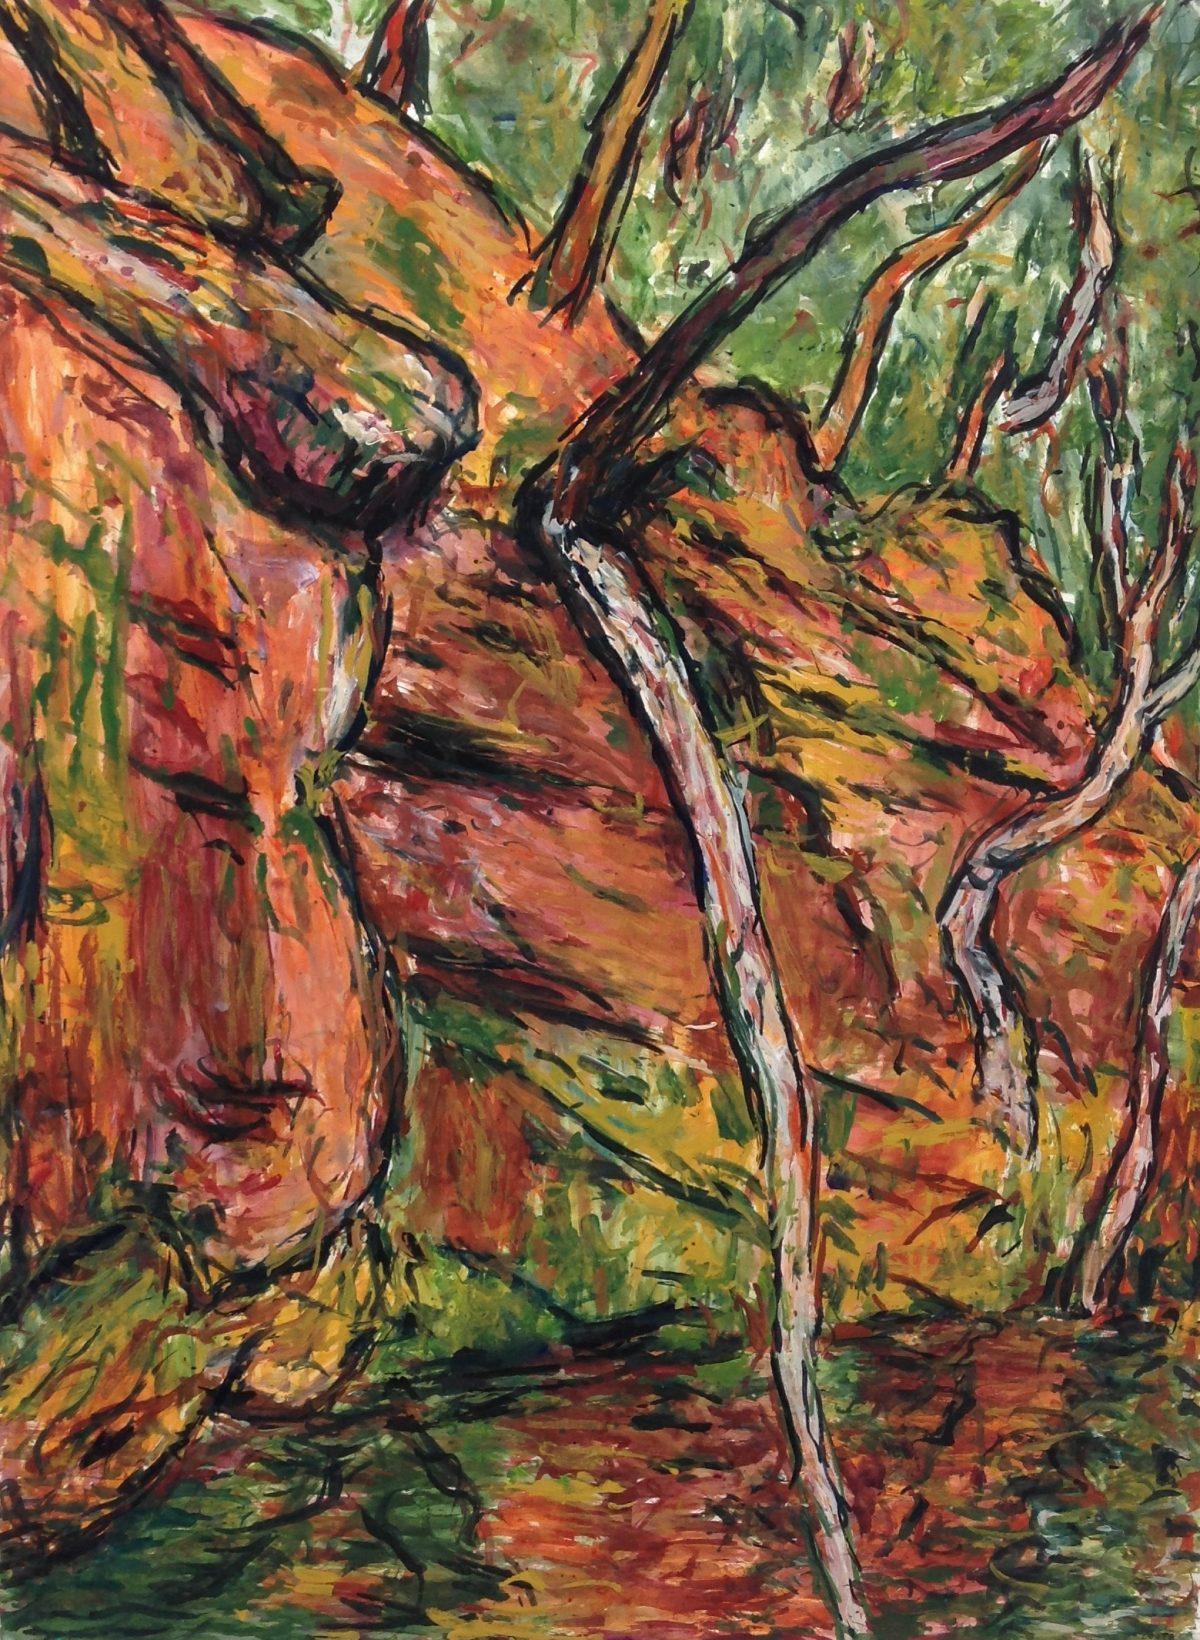 Tony Costa Fallen Tree Audley 152x114 cm mixed media on paper $ 9000